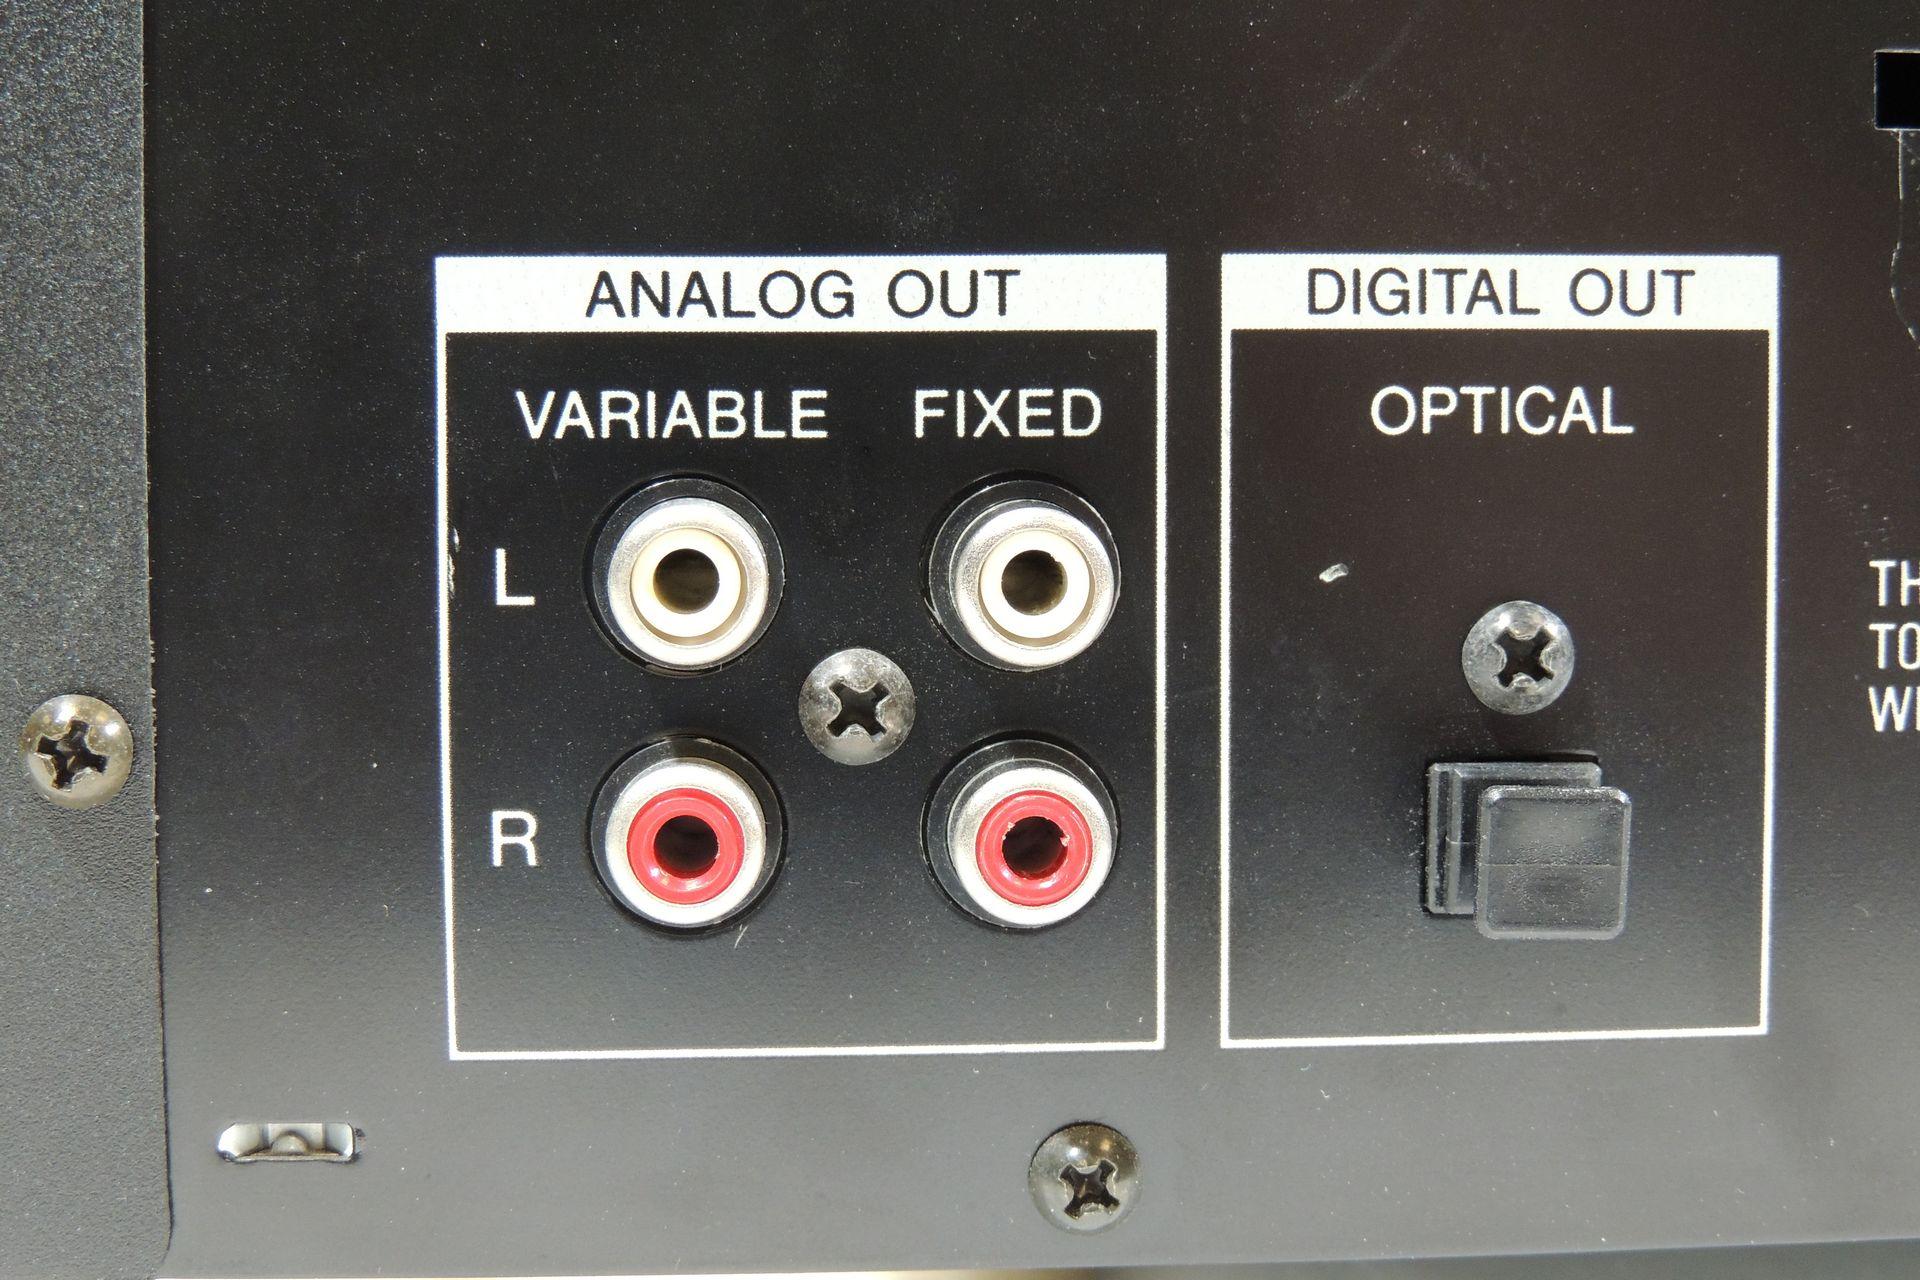 Aiwa XA-003 hi-fi amplifier and Aiwa XC-750 CD player for sale at Plasma Music